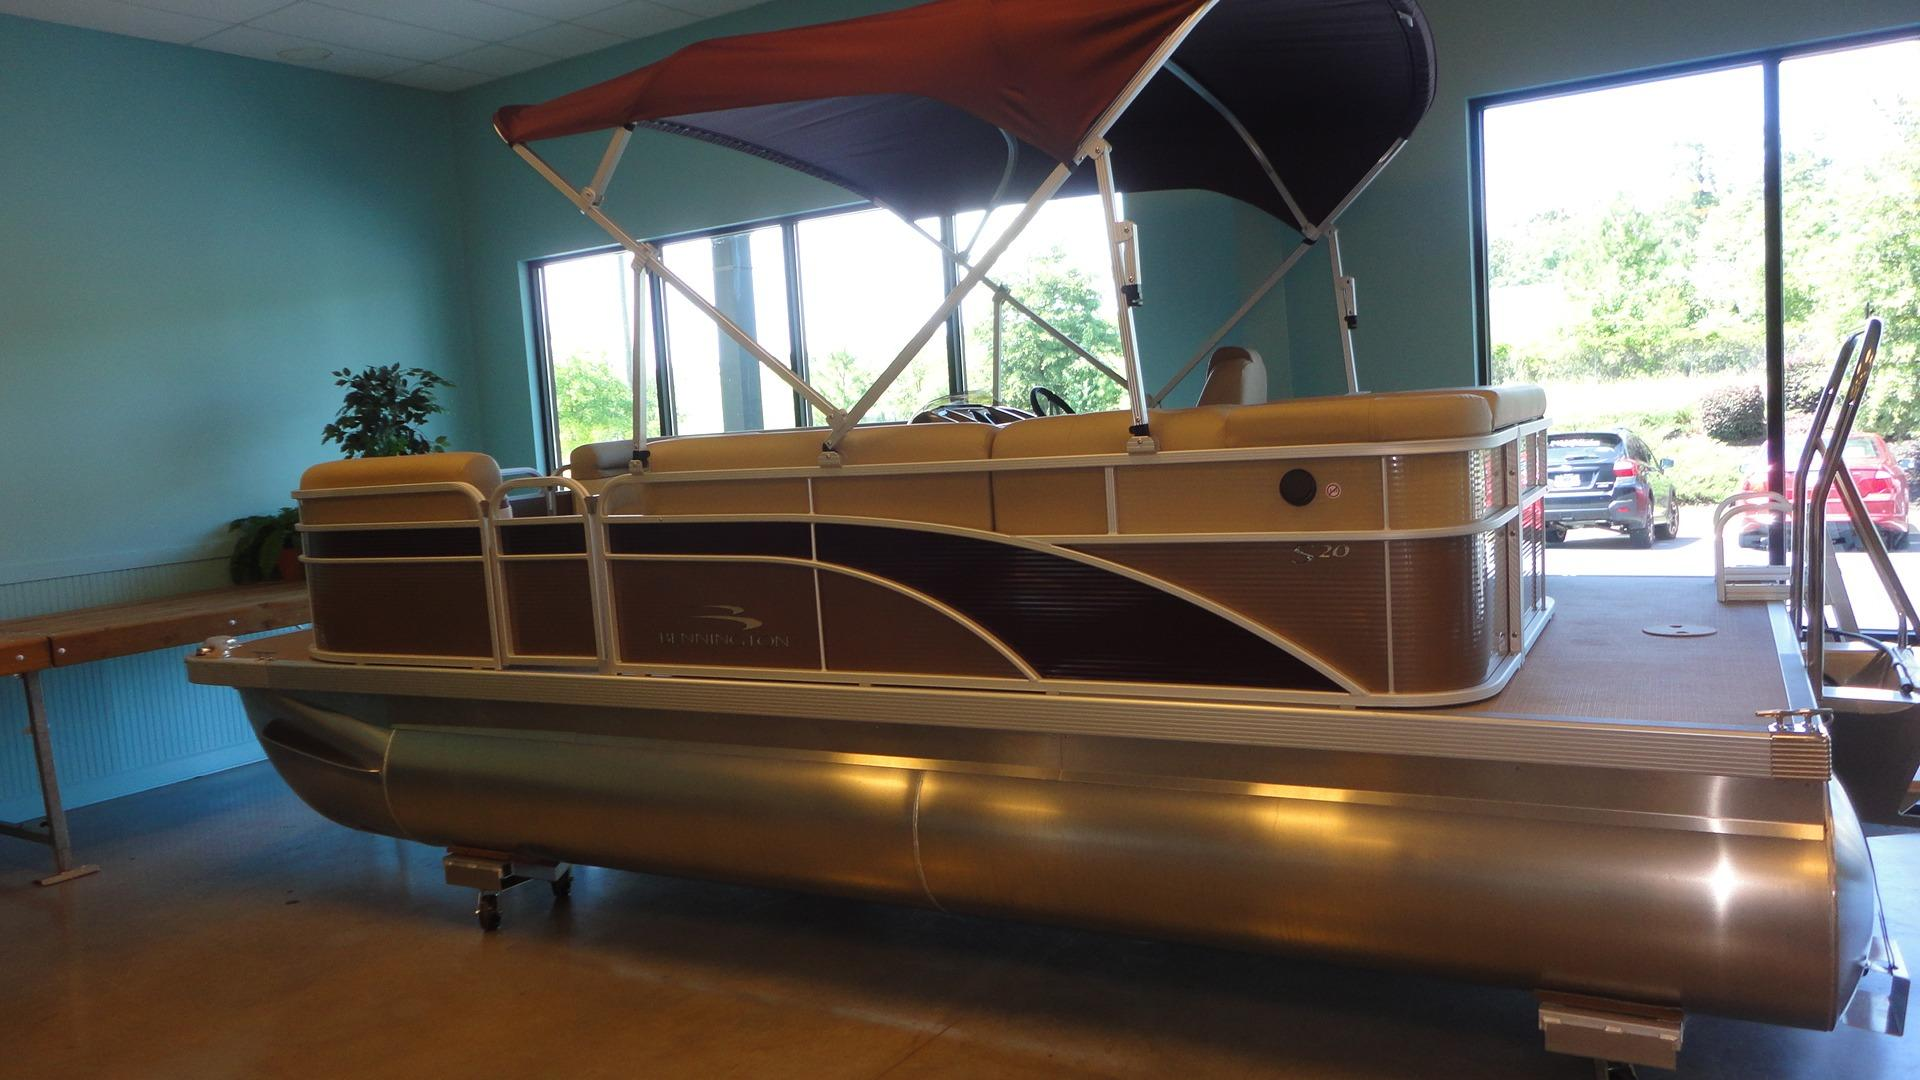 2017 Bennington 20 SL Cruise Extended Deck